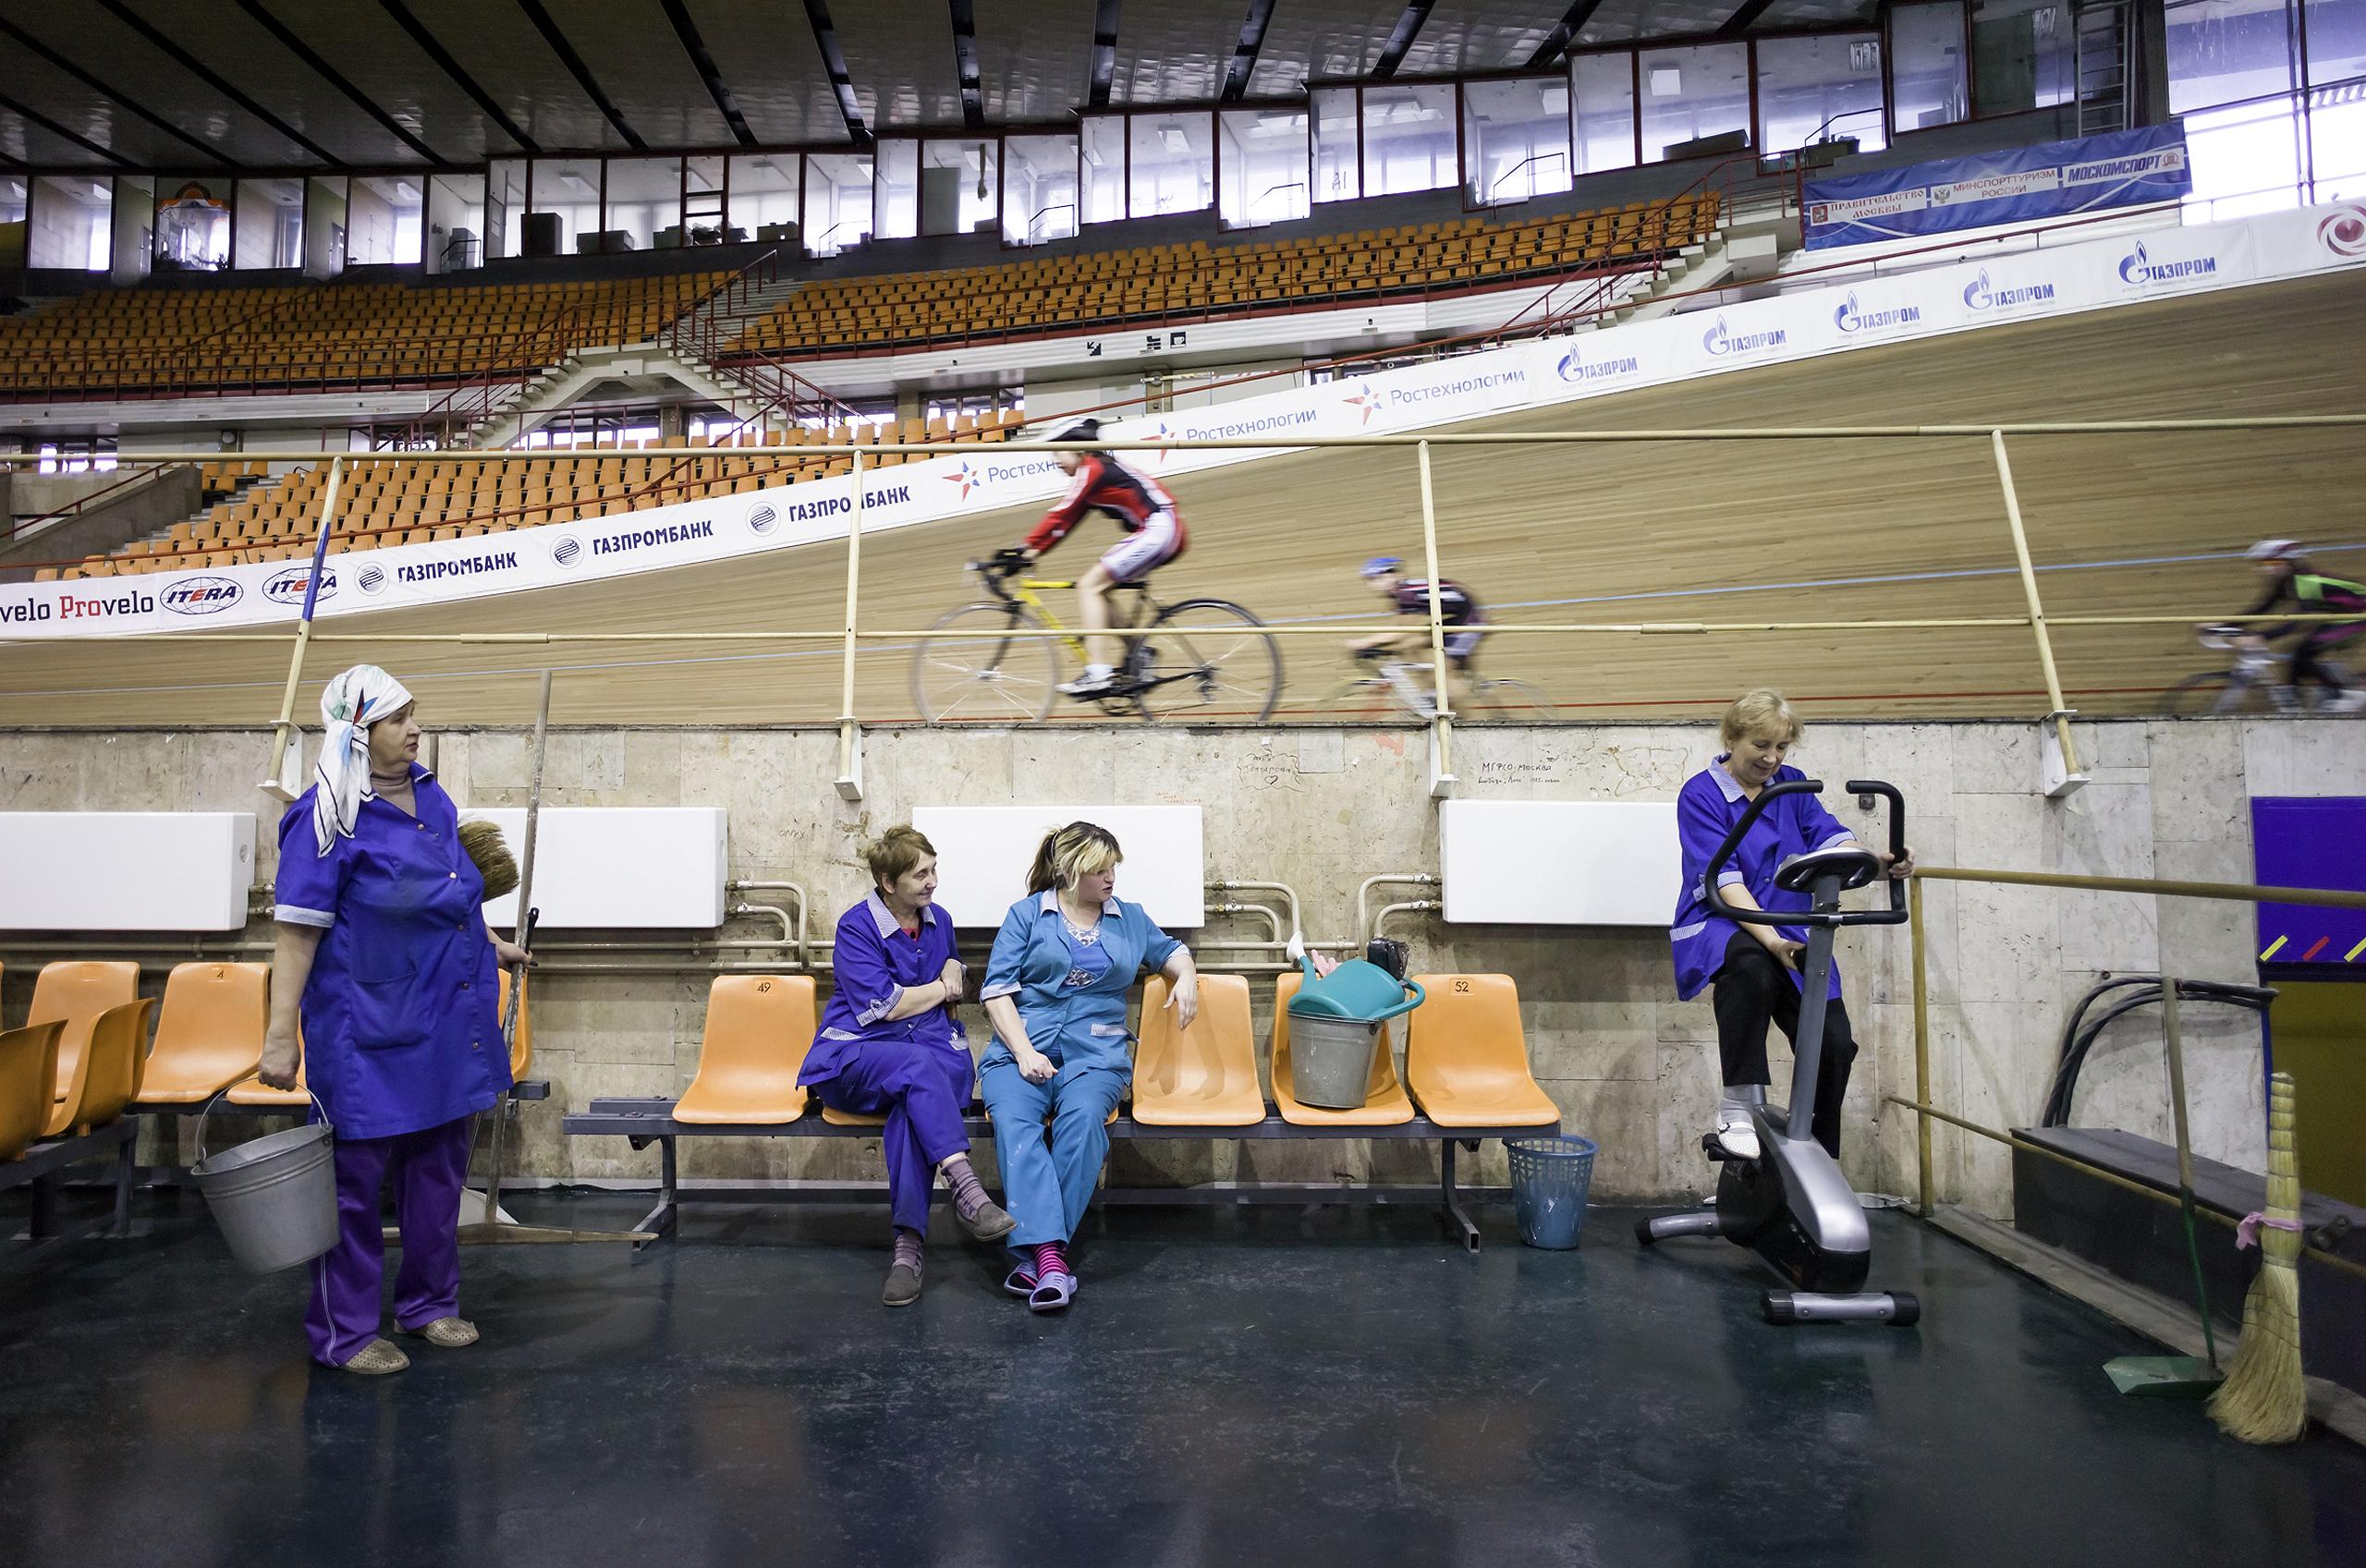 Cleaning women take a break at the Krylatskoye Sports Complex Velodrome in Moscow.